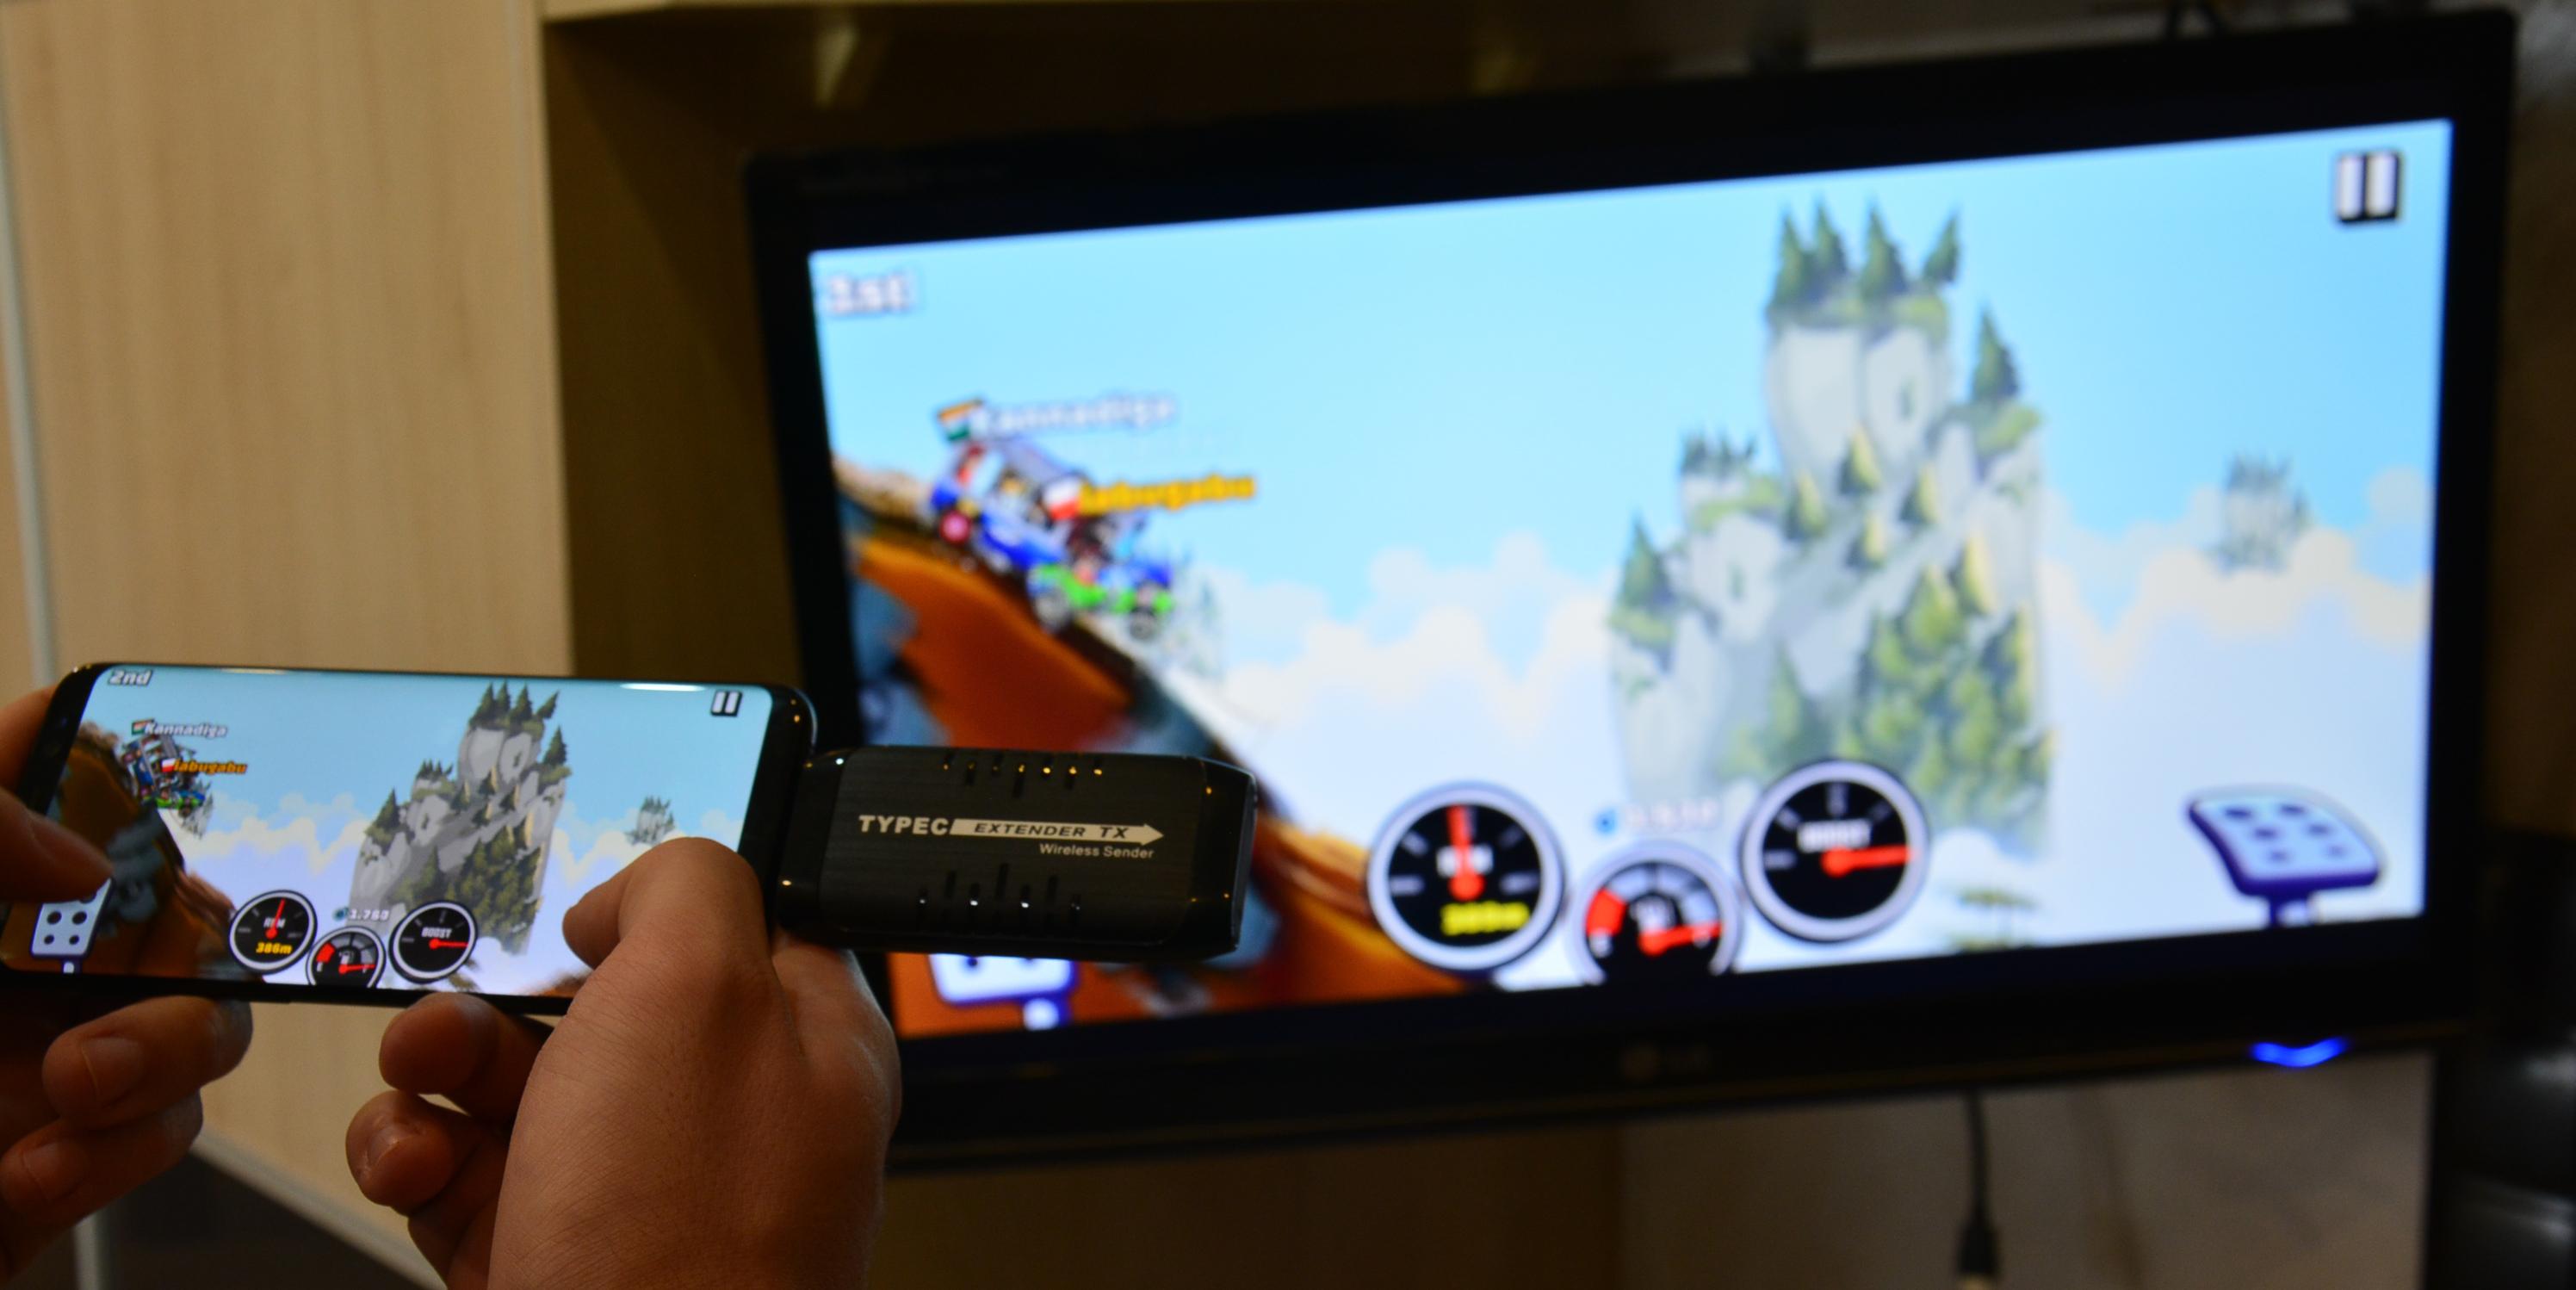 Bezprzewodowy transmiter USB-C na HDMI